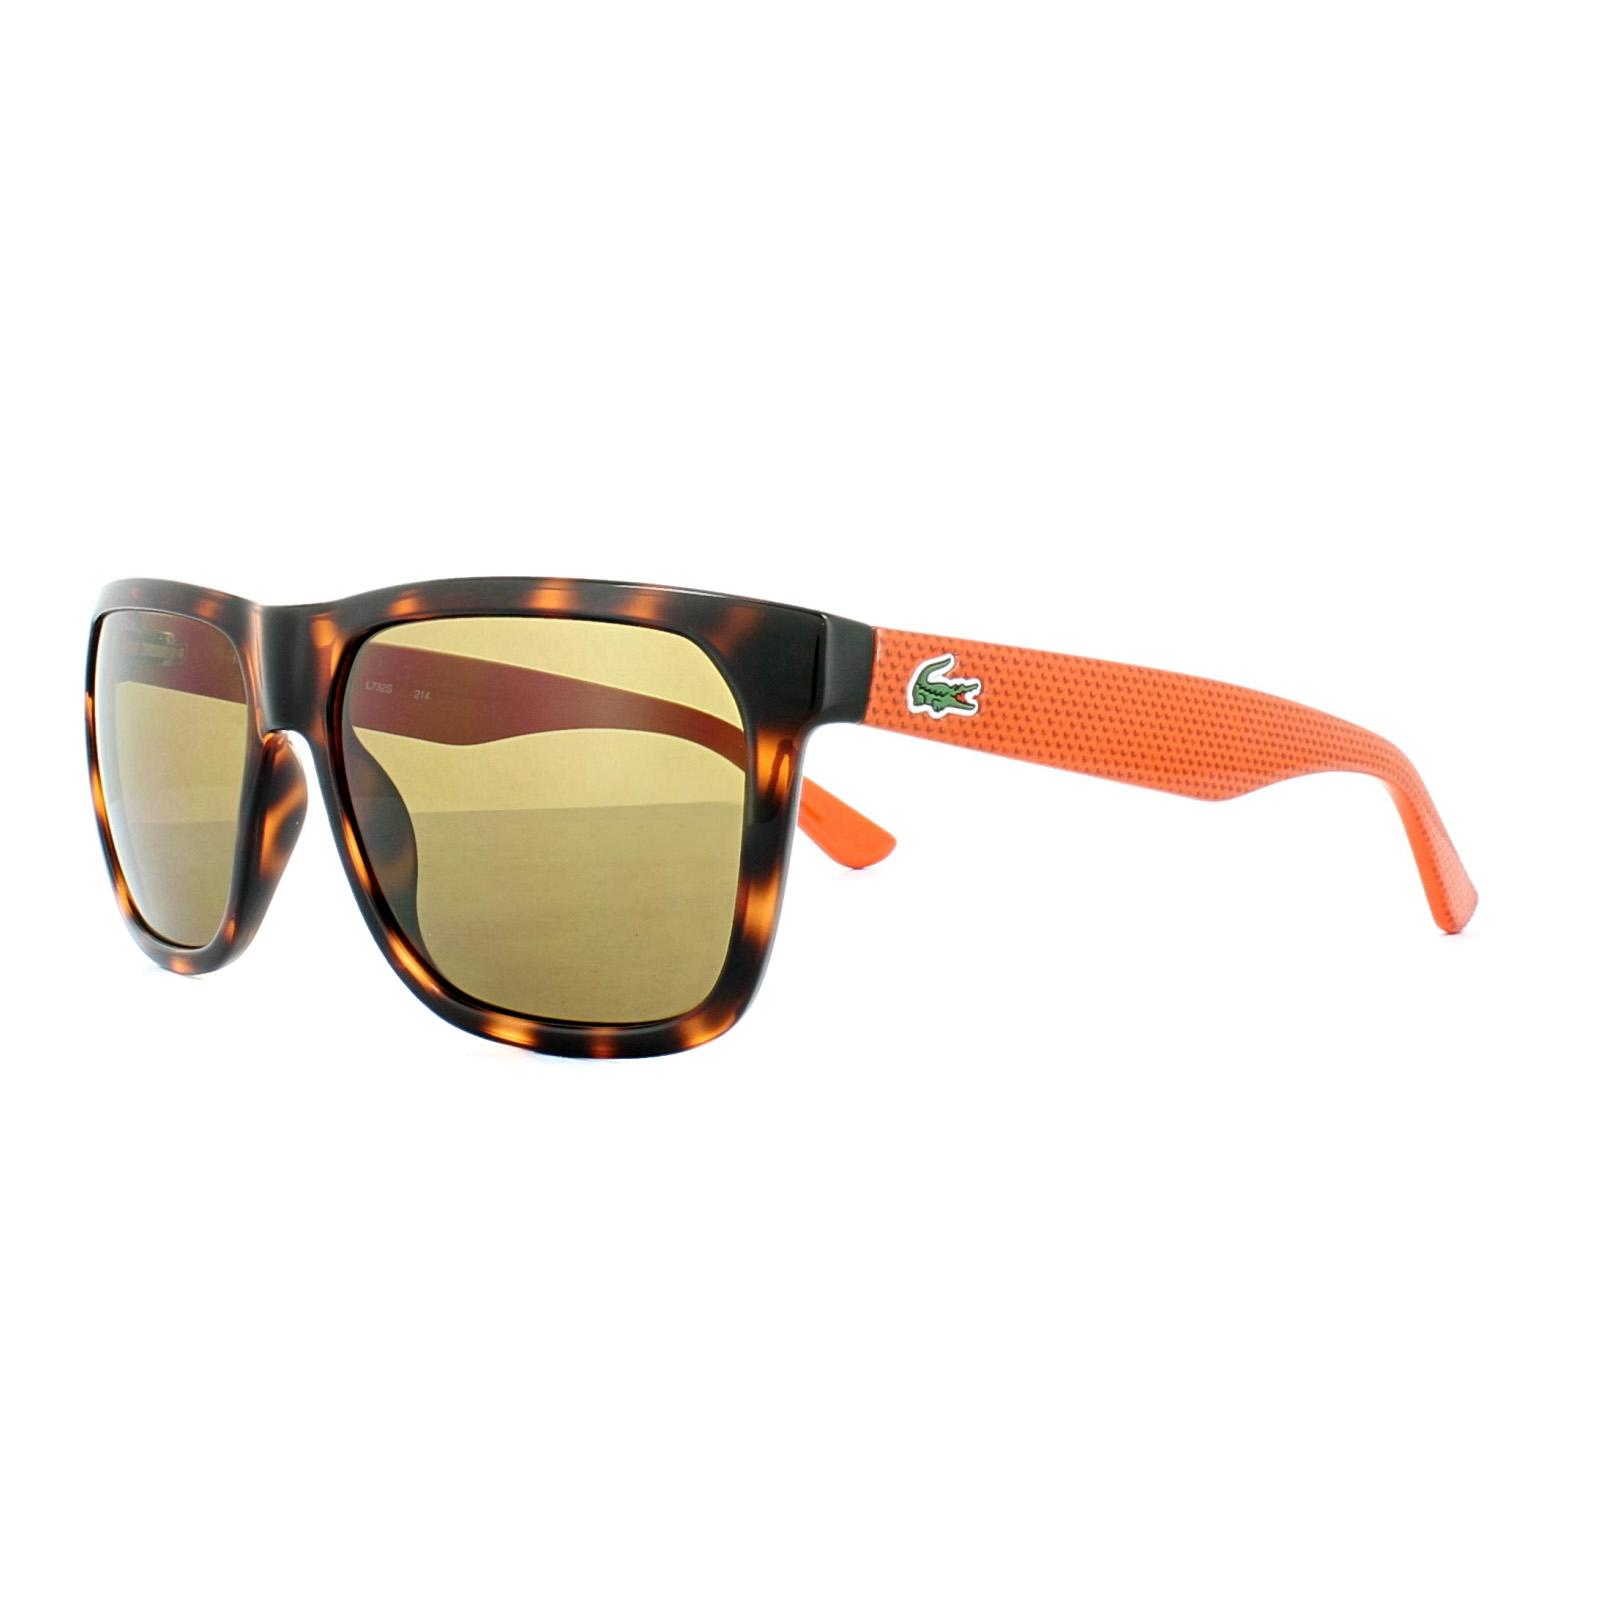 4bbe3c94355d5 Lacoste Sunglasses L732S 214 Havana Brick Brown 883121964372   eBay